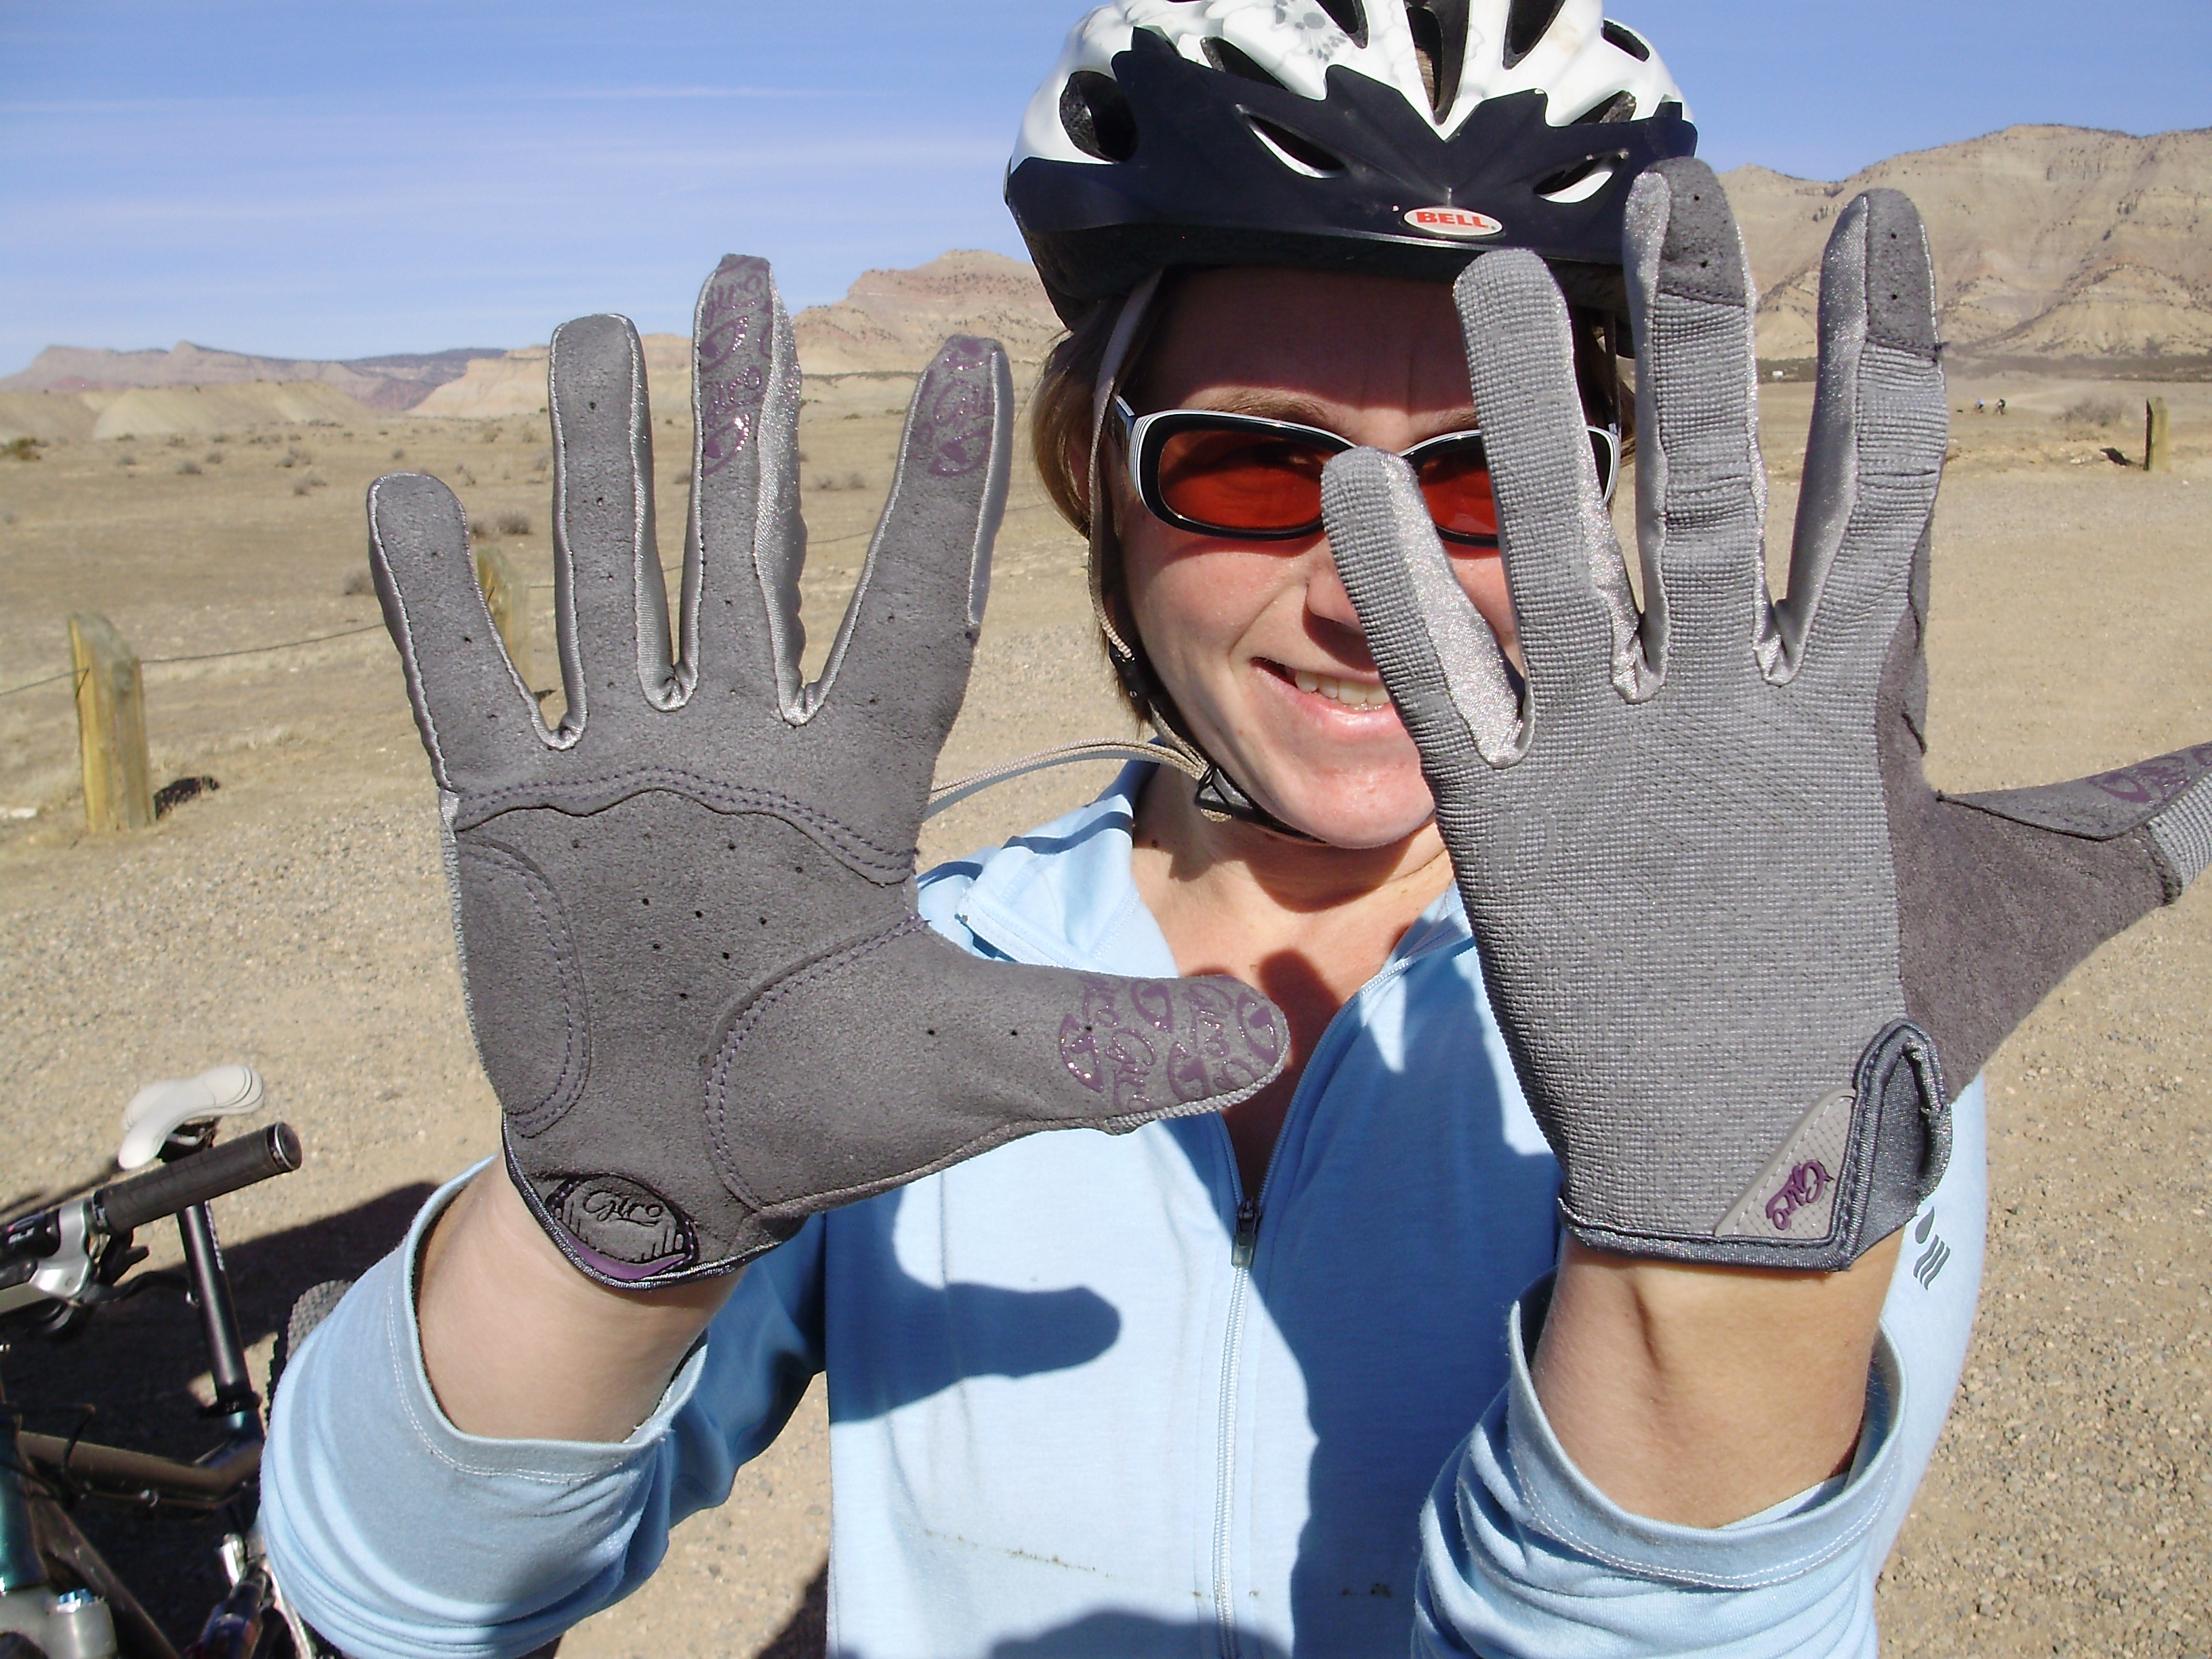 LA DND Women's Cycling Trail Gloves